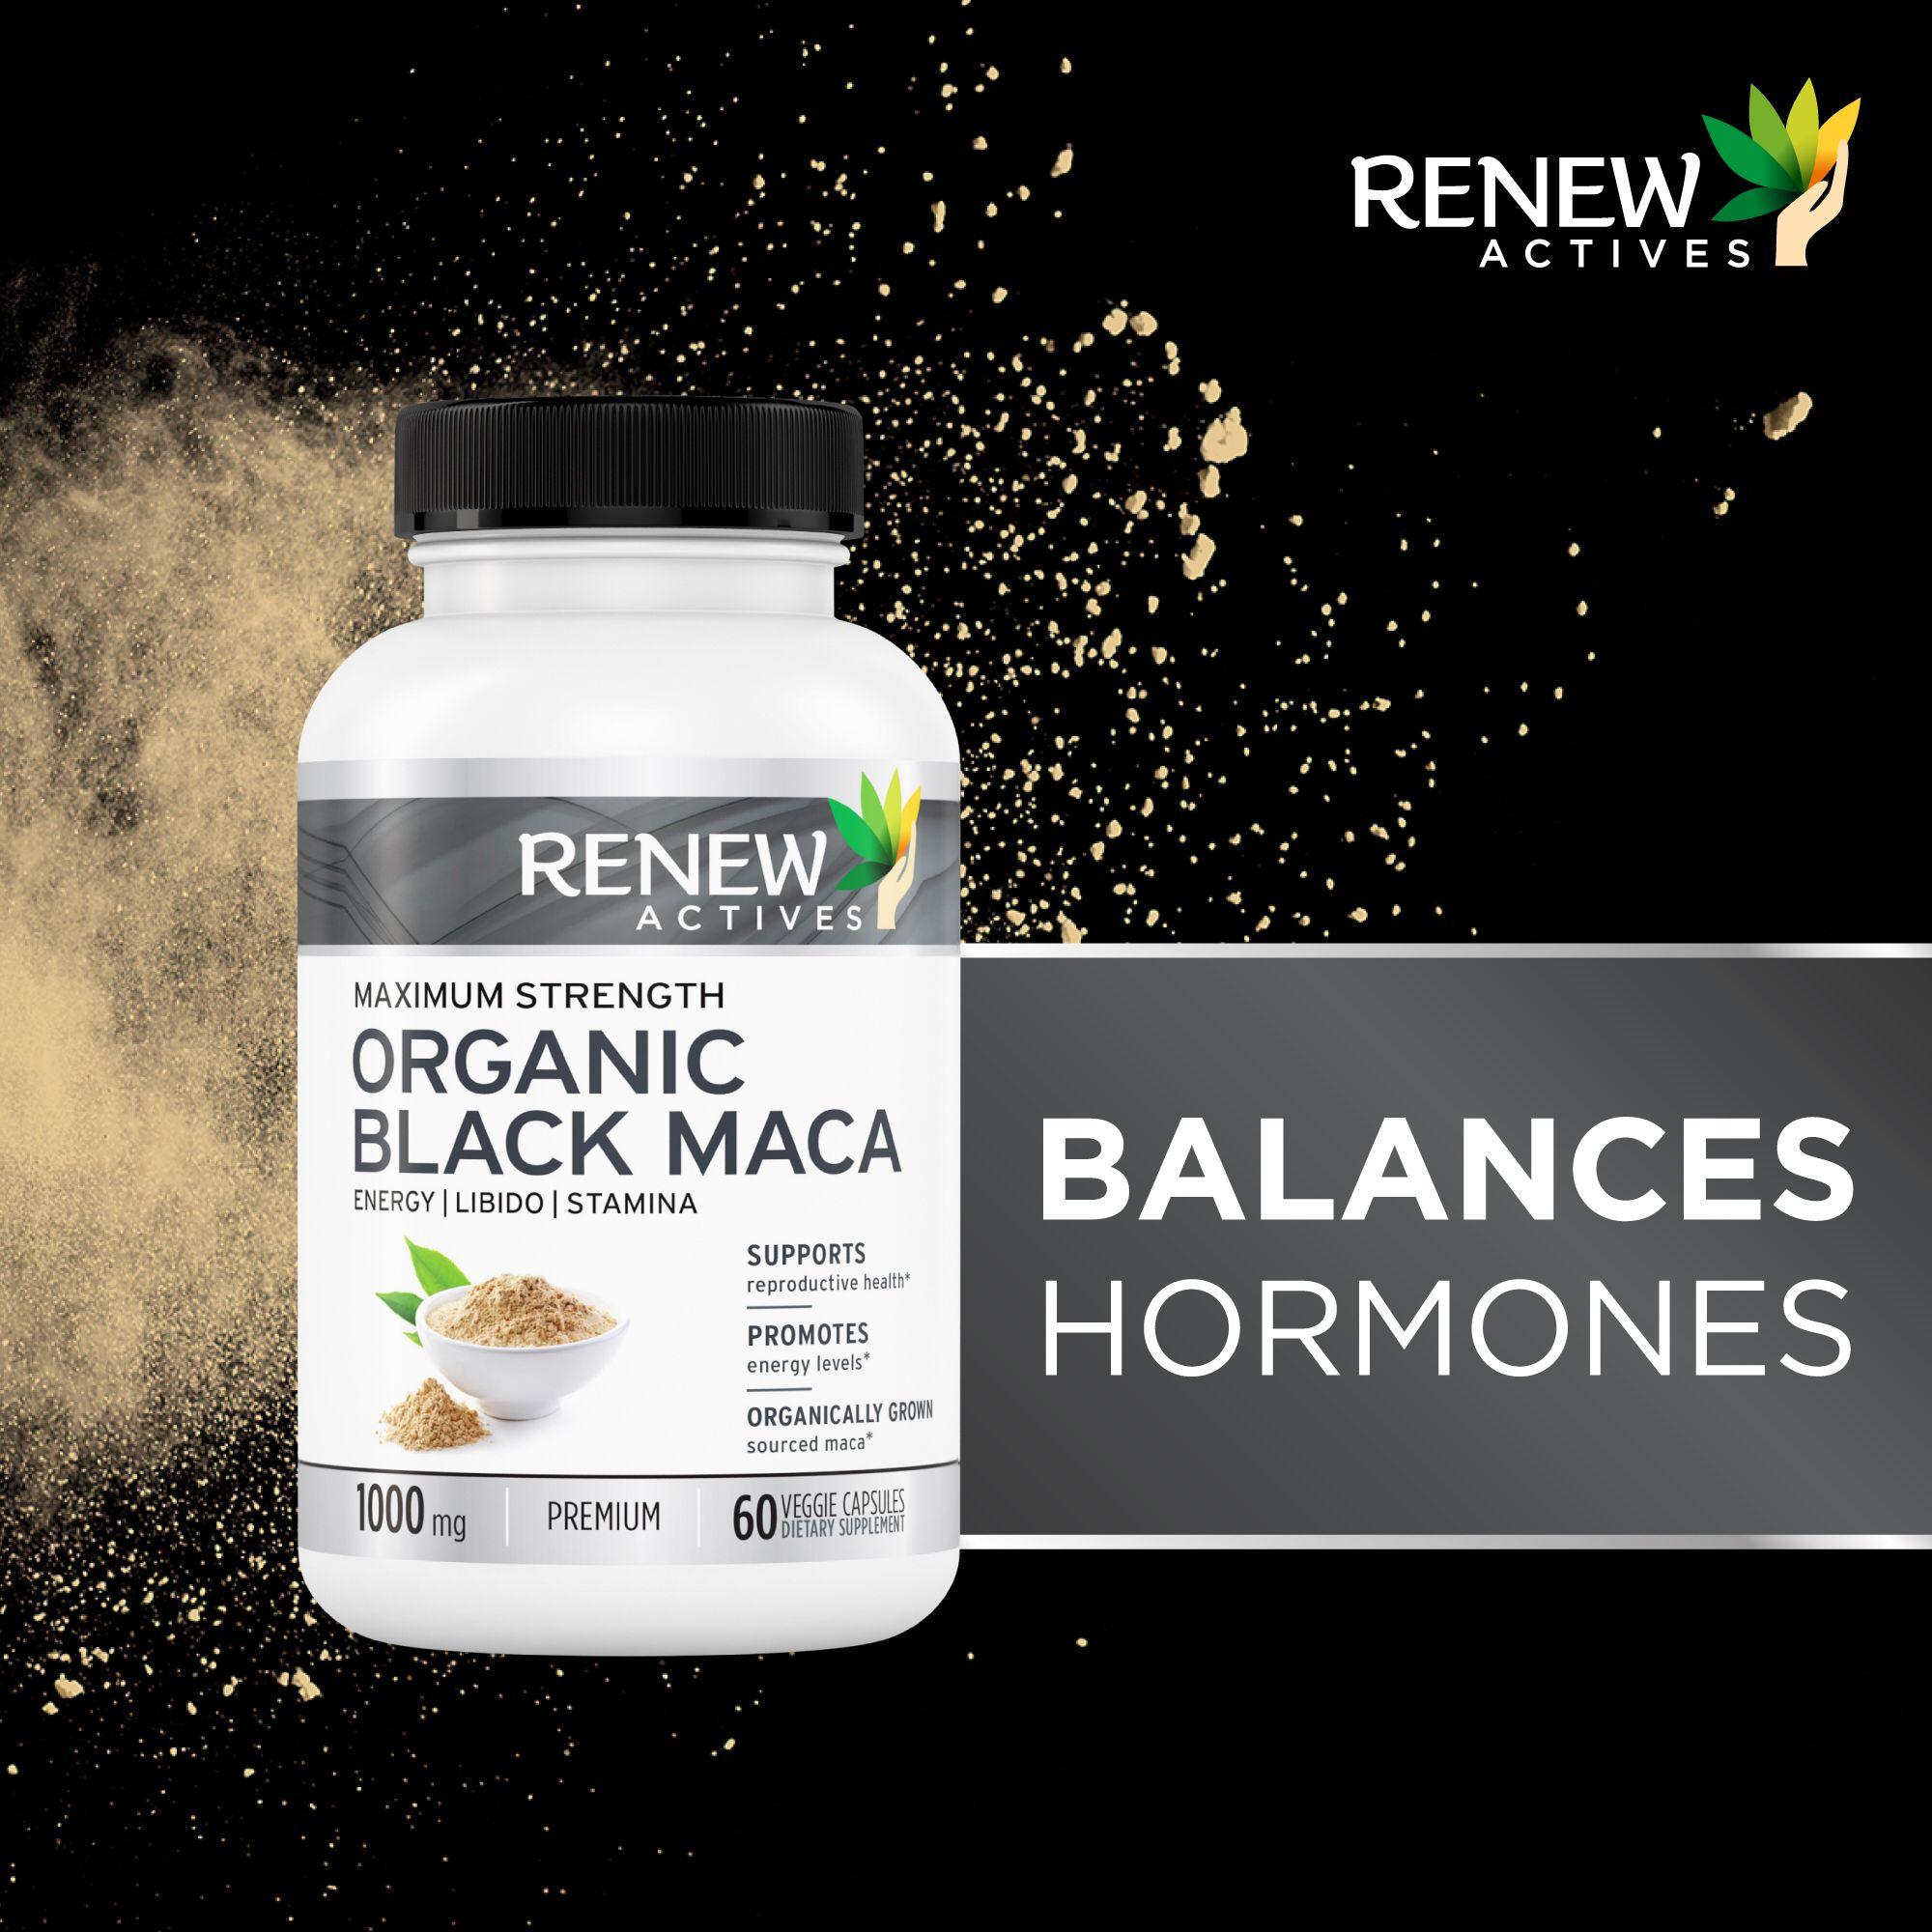 Black Maca is able to balance hormones in both men and women